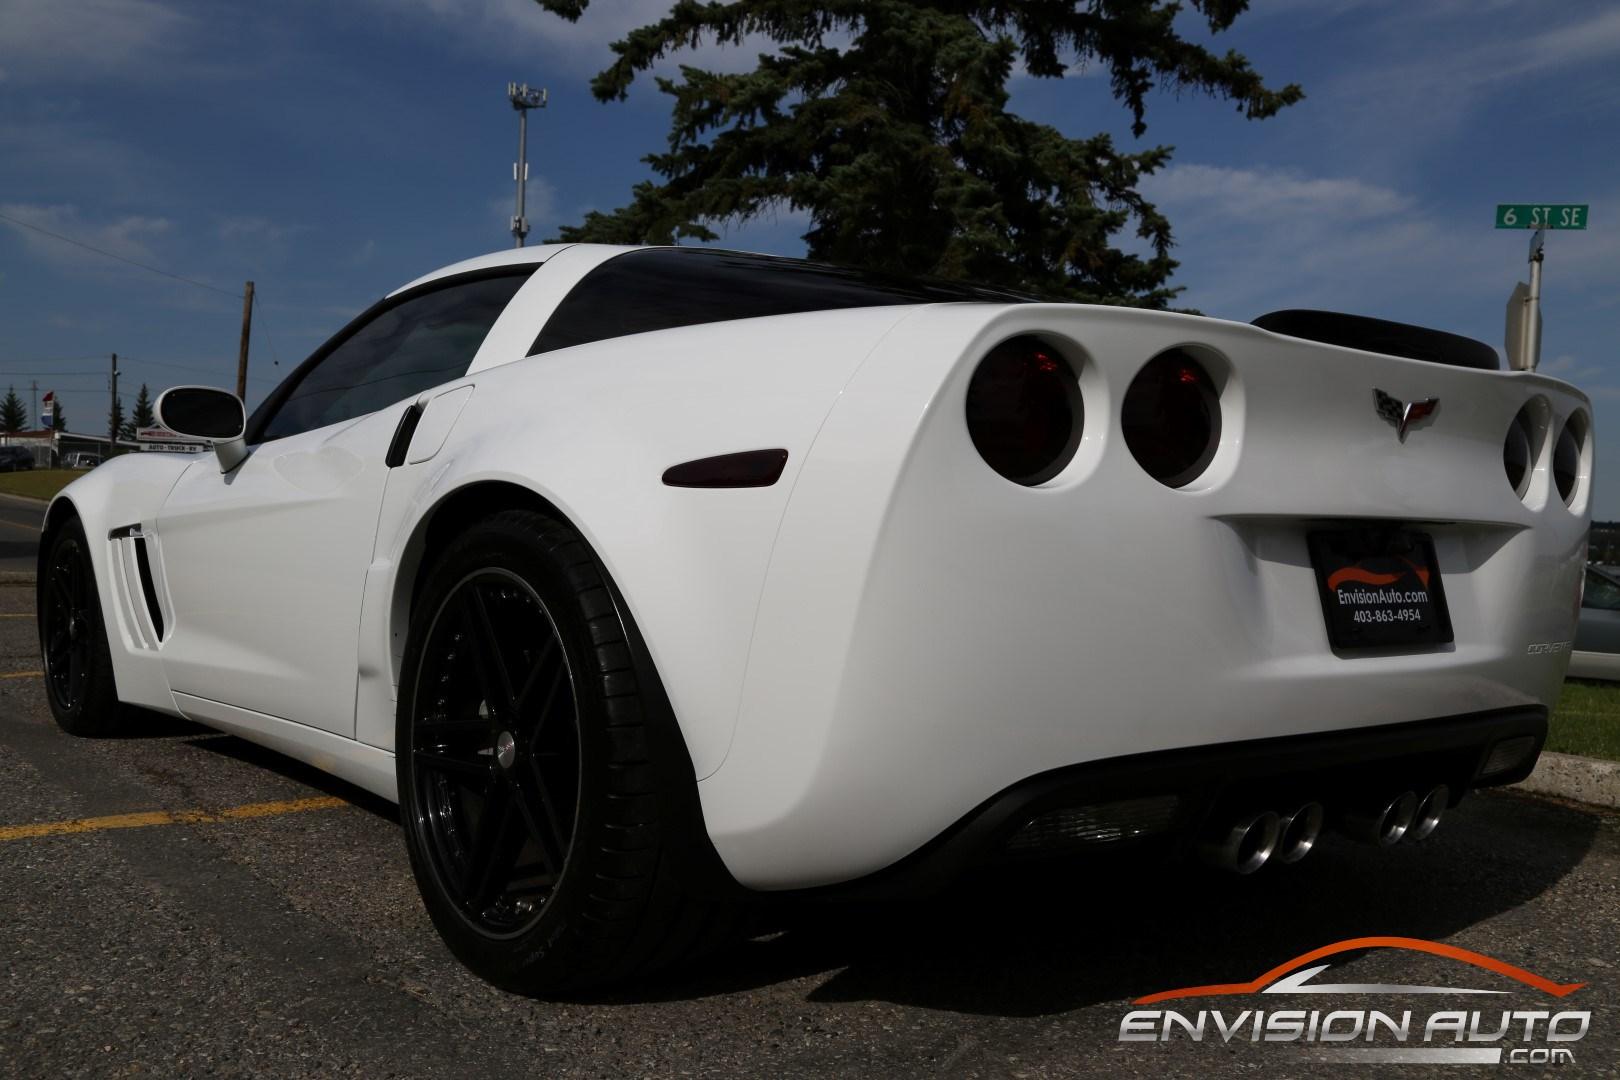 2011 Chevrolet Corvette Coupe Grand Sport Ecs 530 Hp